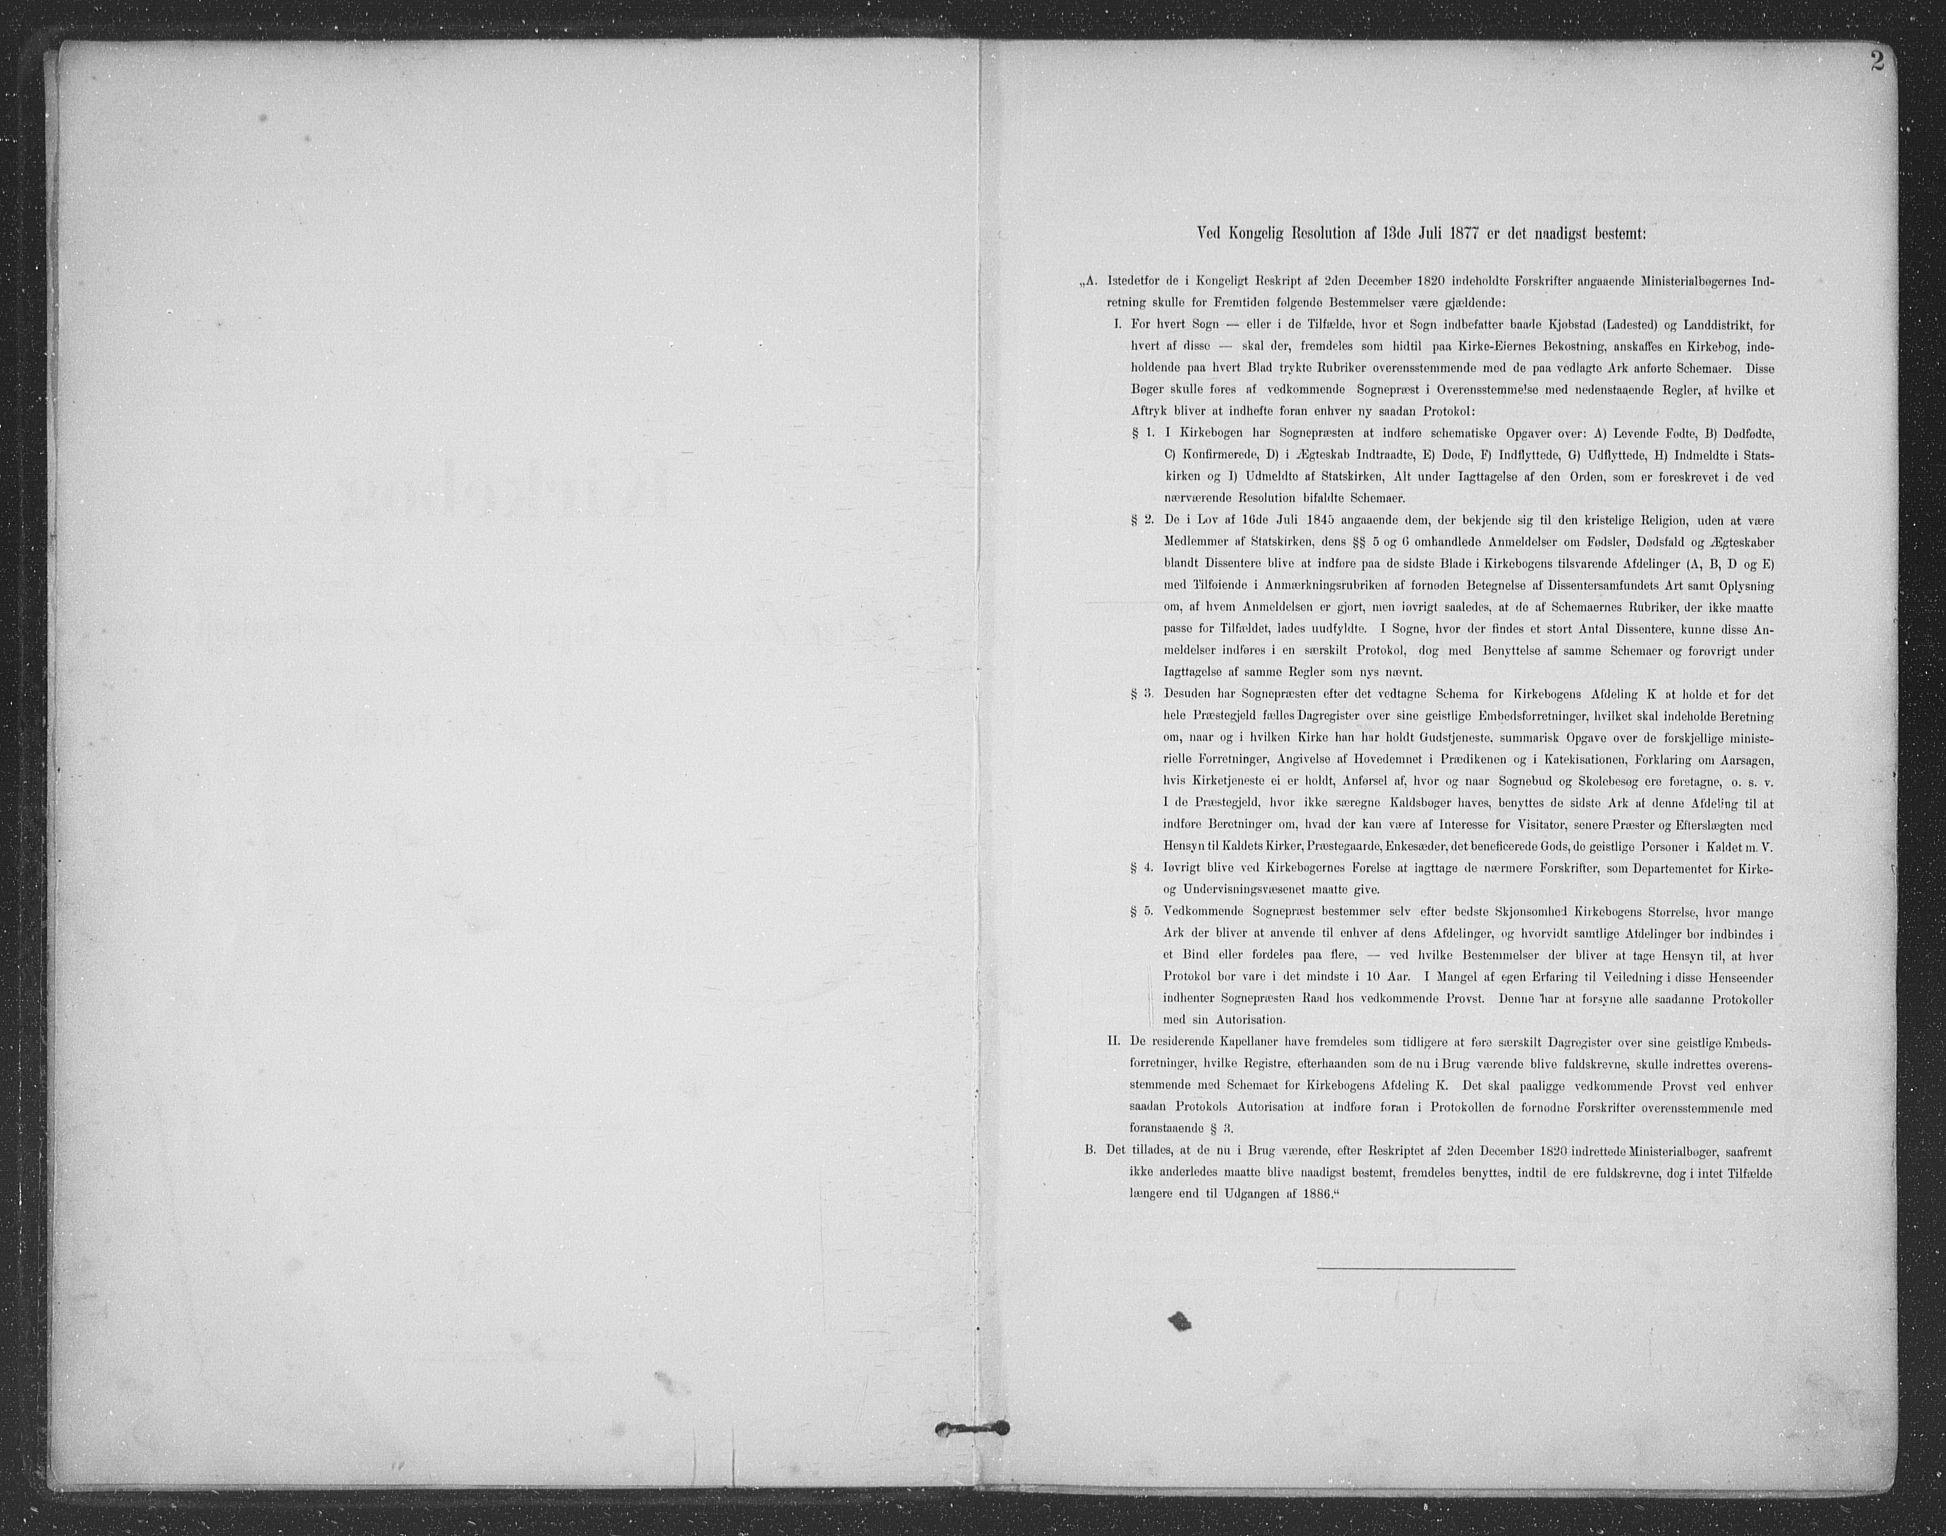 SAT, Ministerialprotokoller, klokkerbøker og fødselsregistre - Nordland, 863/L0899: Ministerialbok nr. 863A11, 1897-1906, s. 2